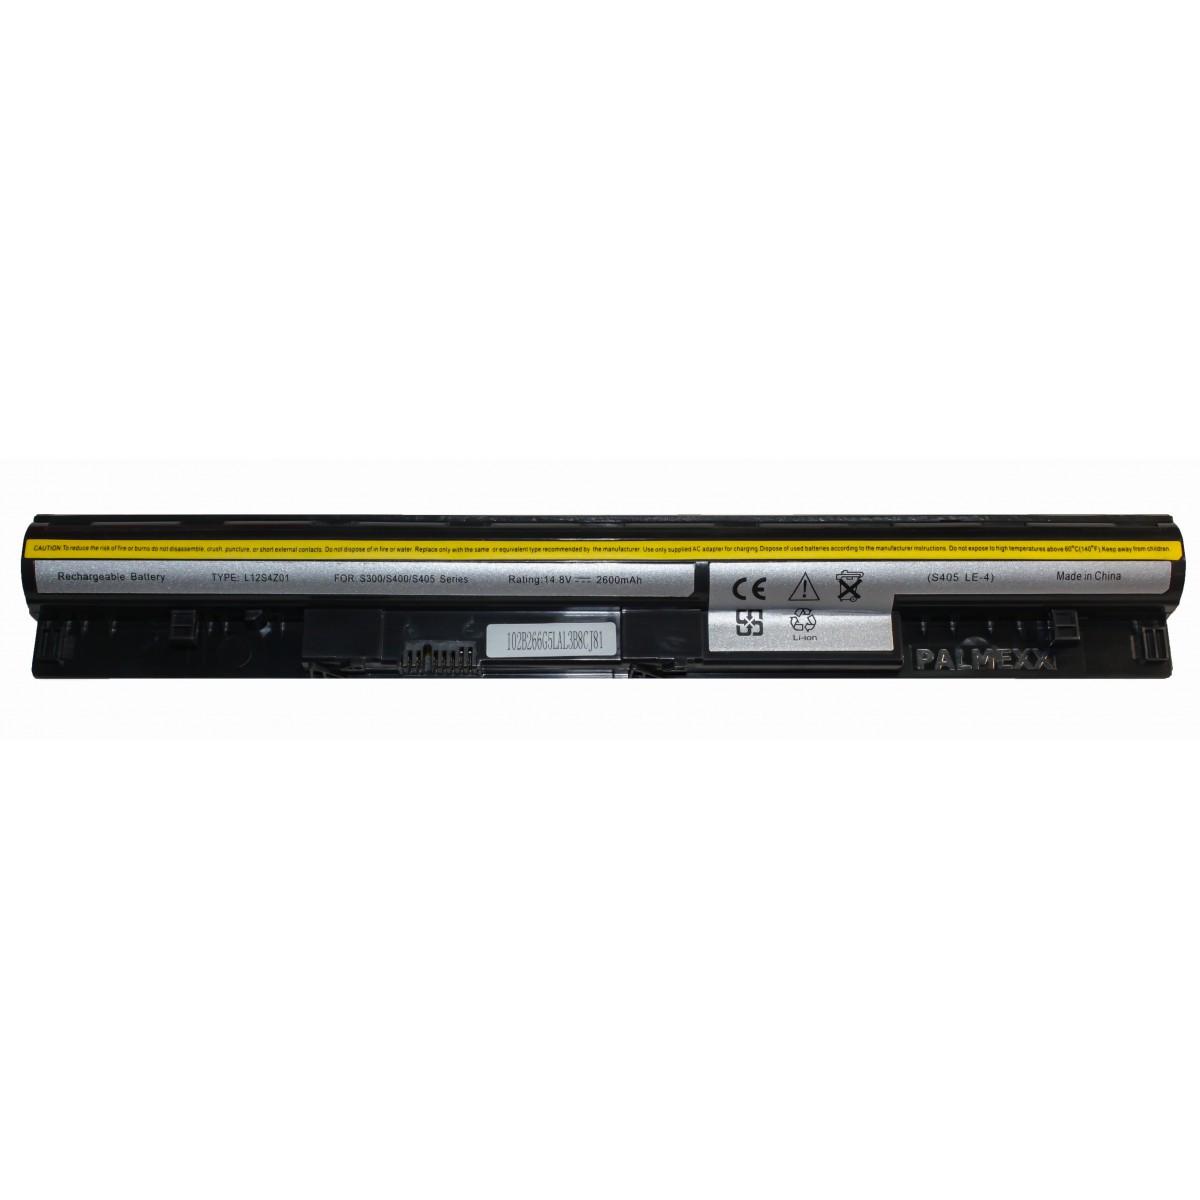 Аккумулятор для ноутбука Lenovo IdeaPad S400, L12S4Z01 (14.8 v, 2200 mAh) Original